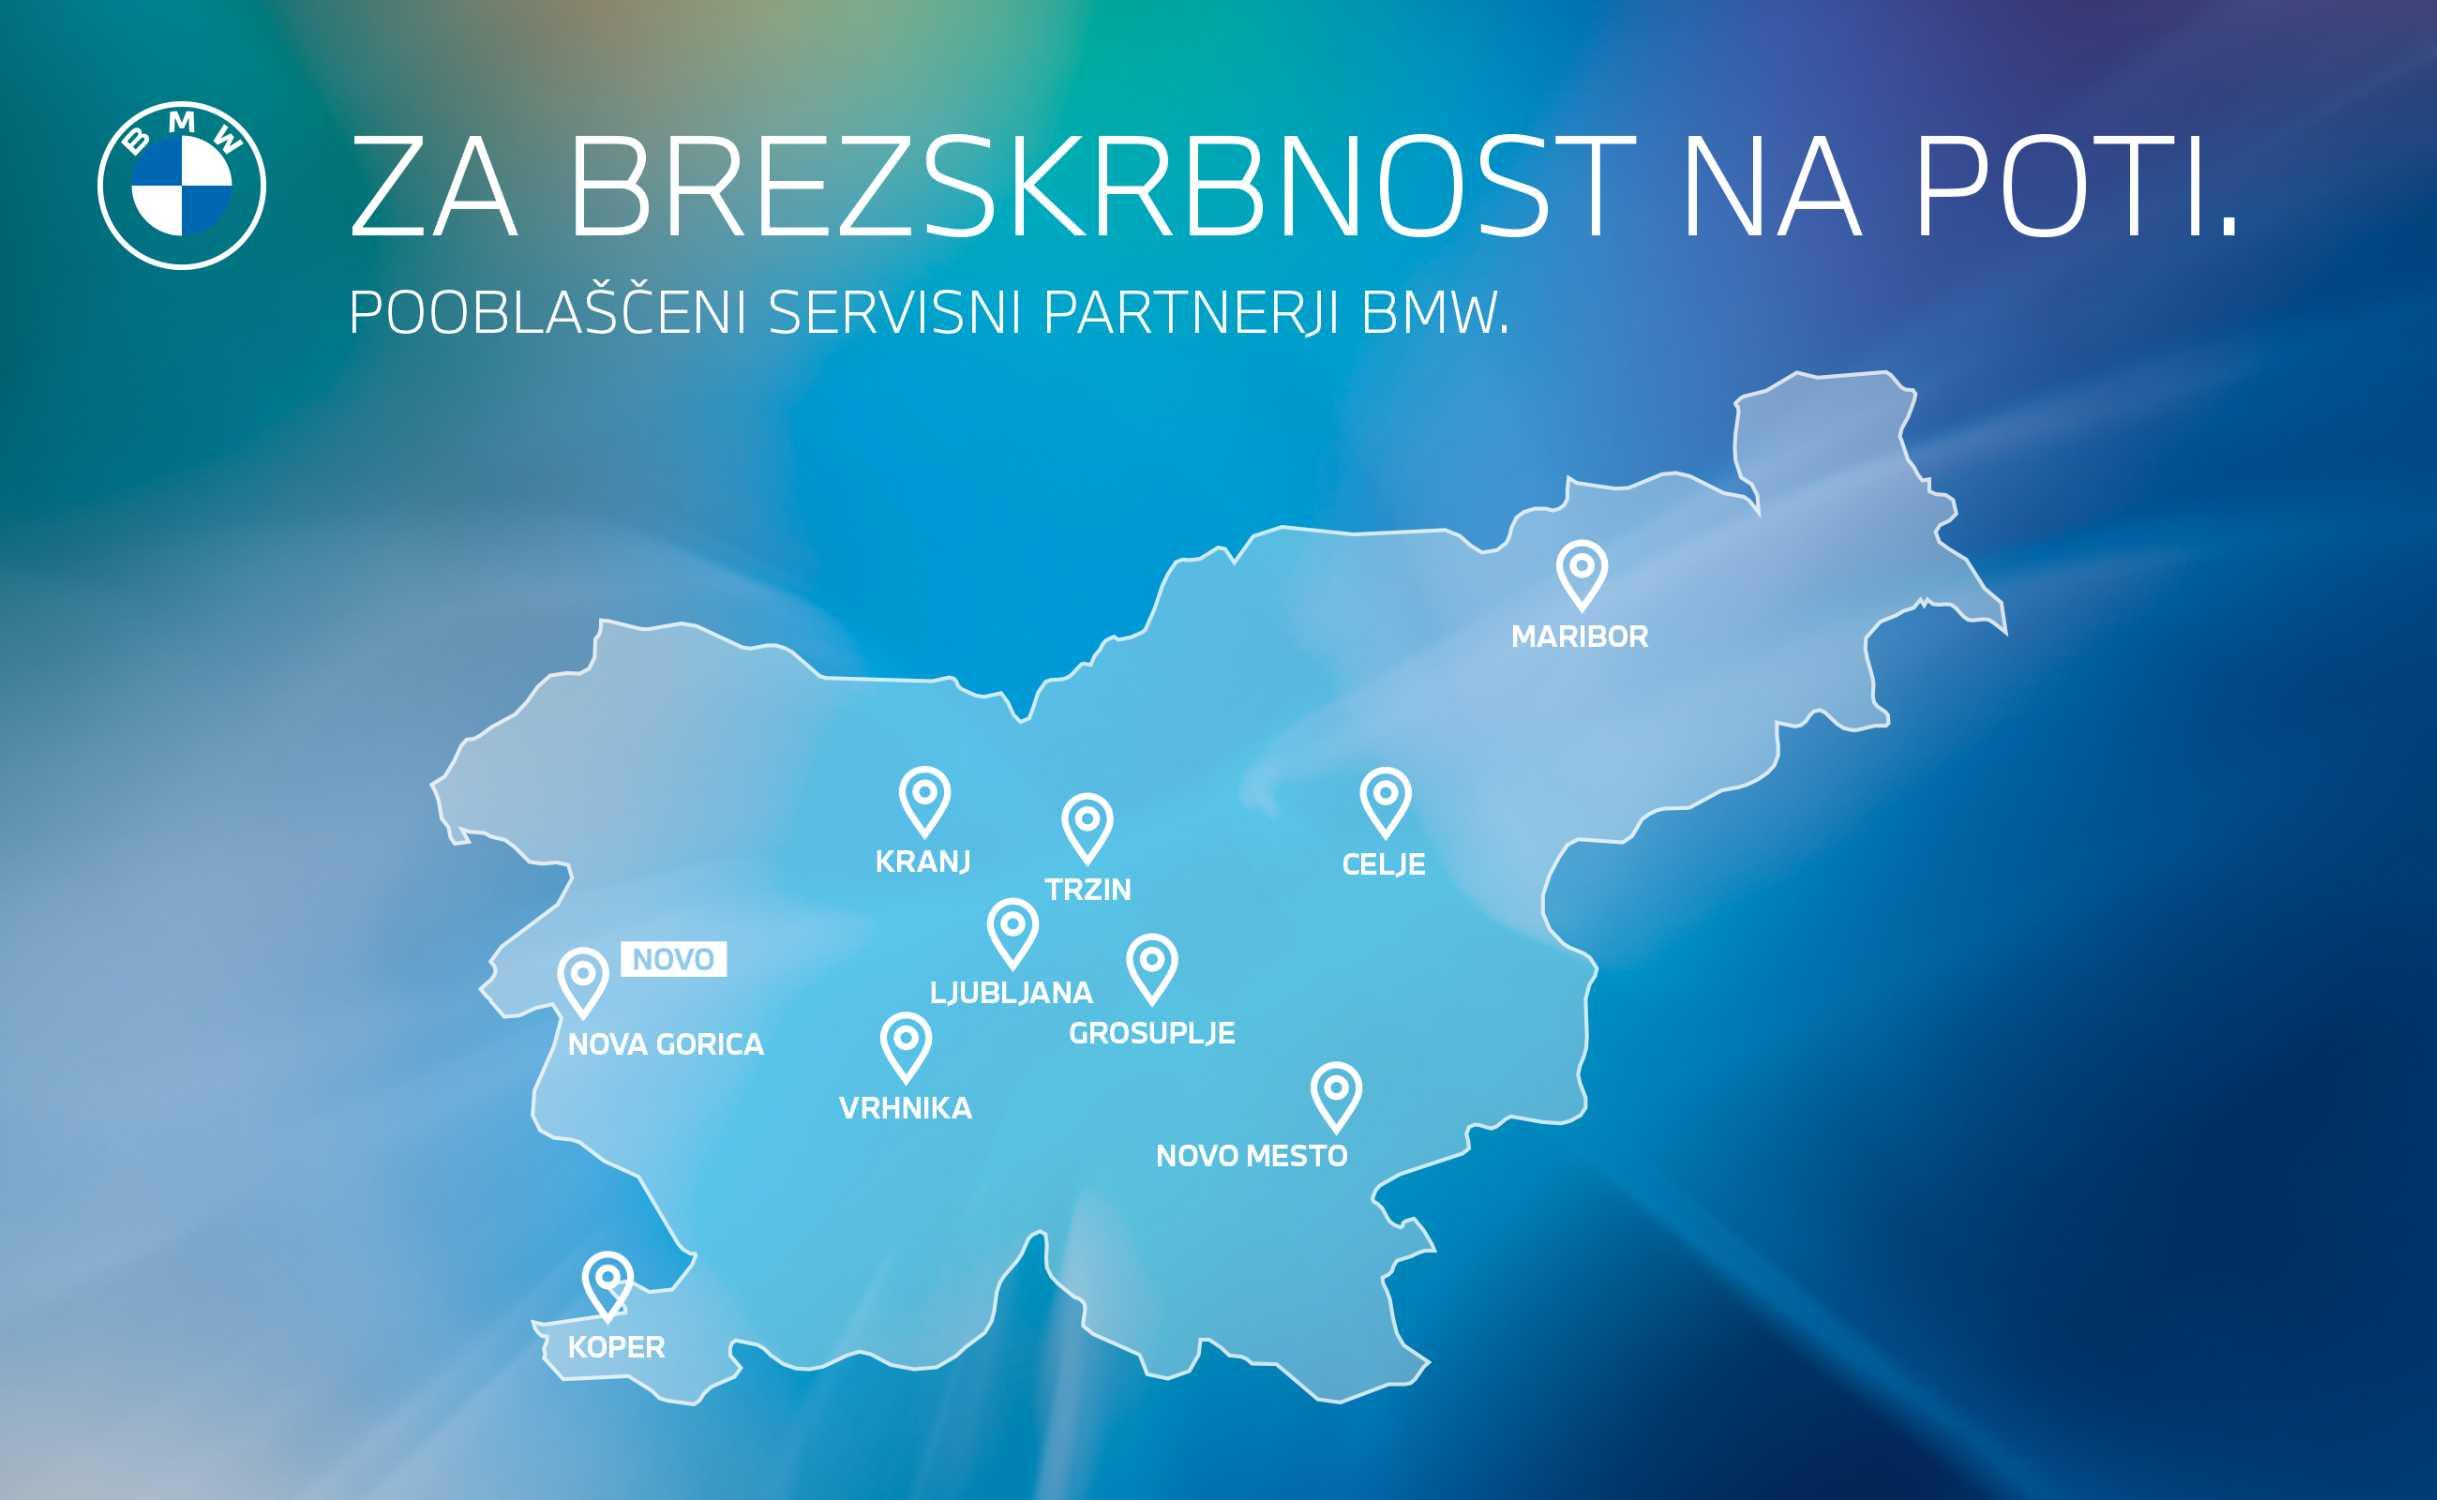 BMW Slovenia service network (05/2020)